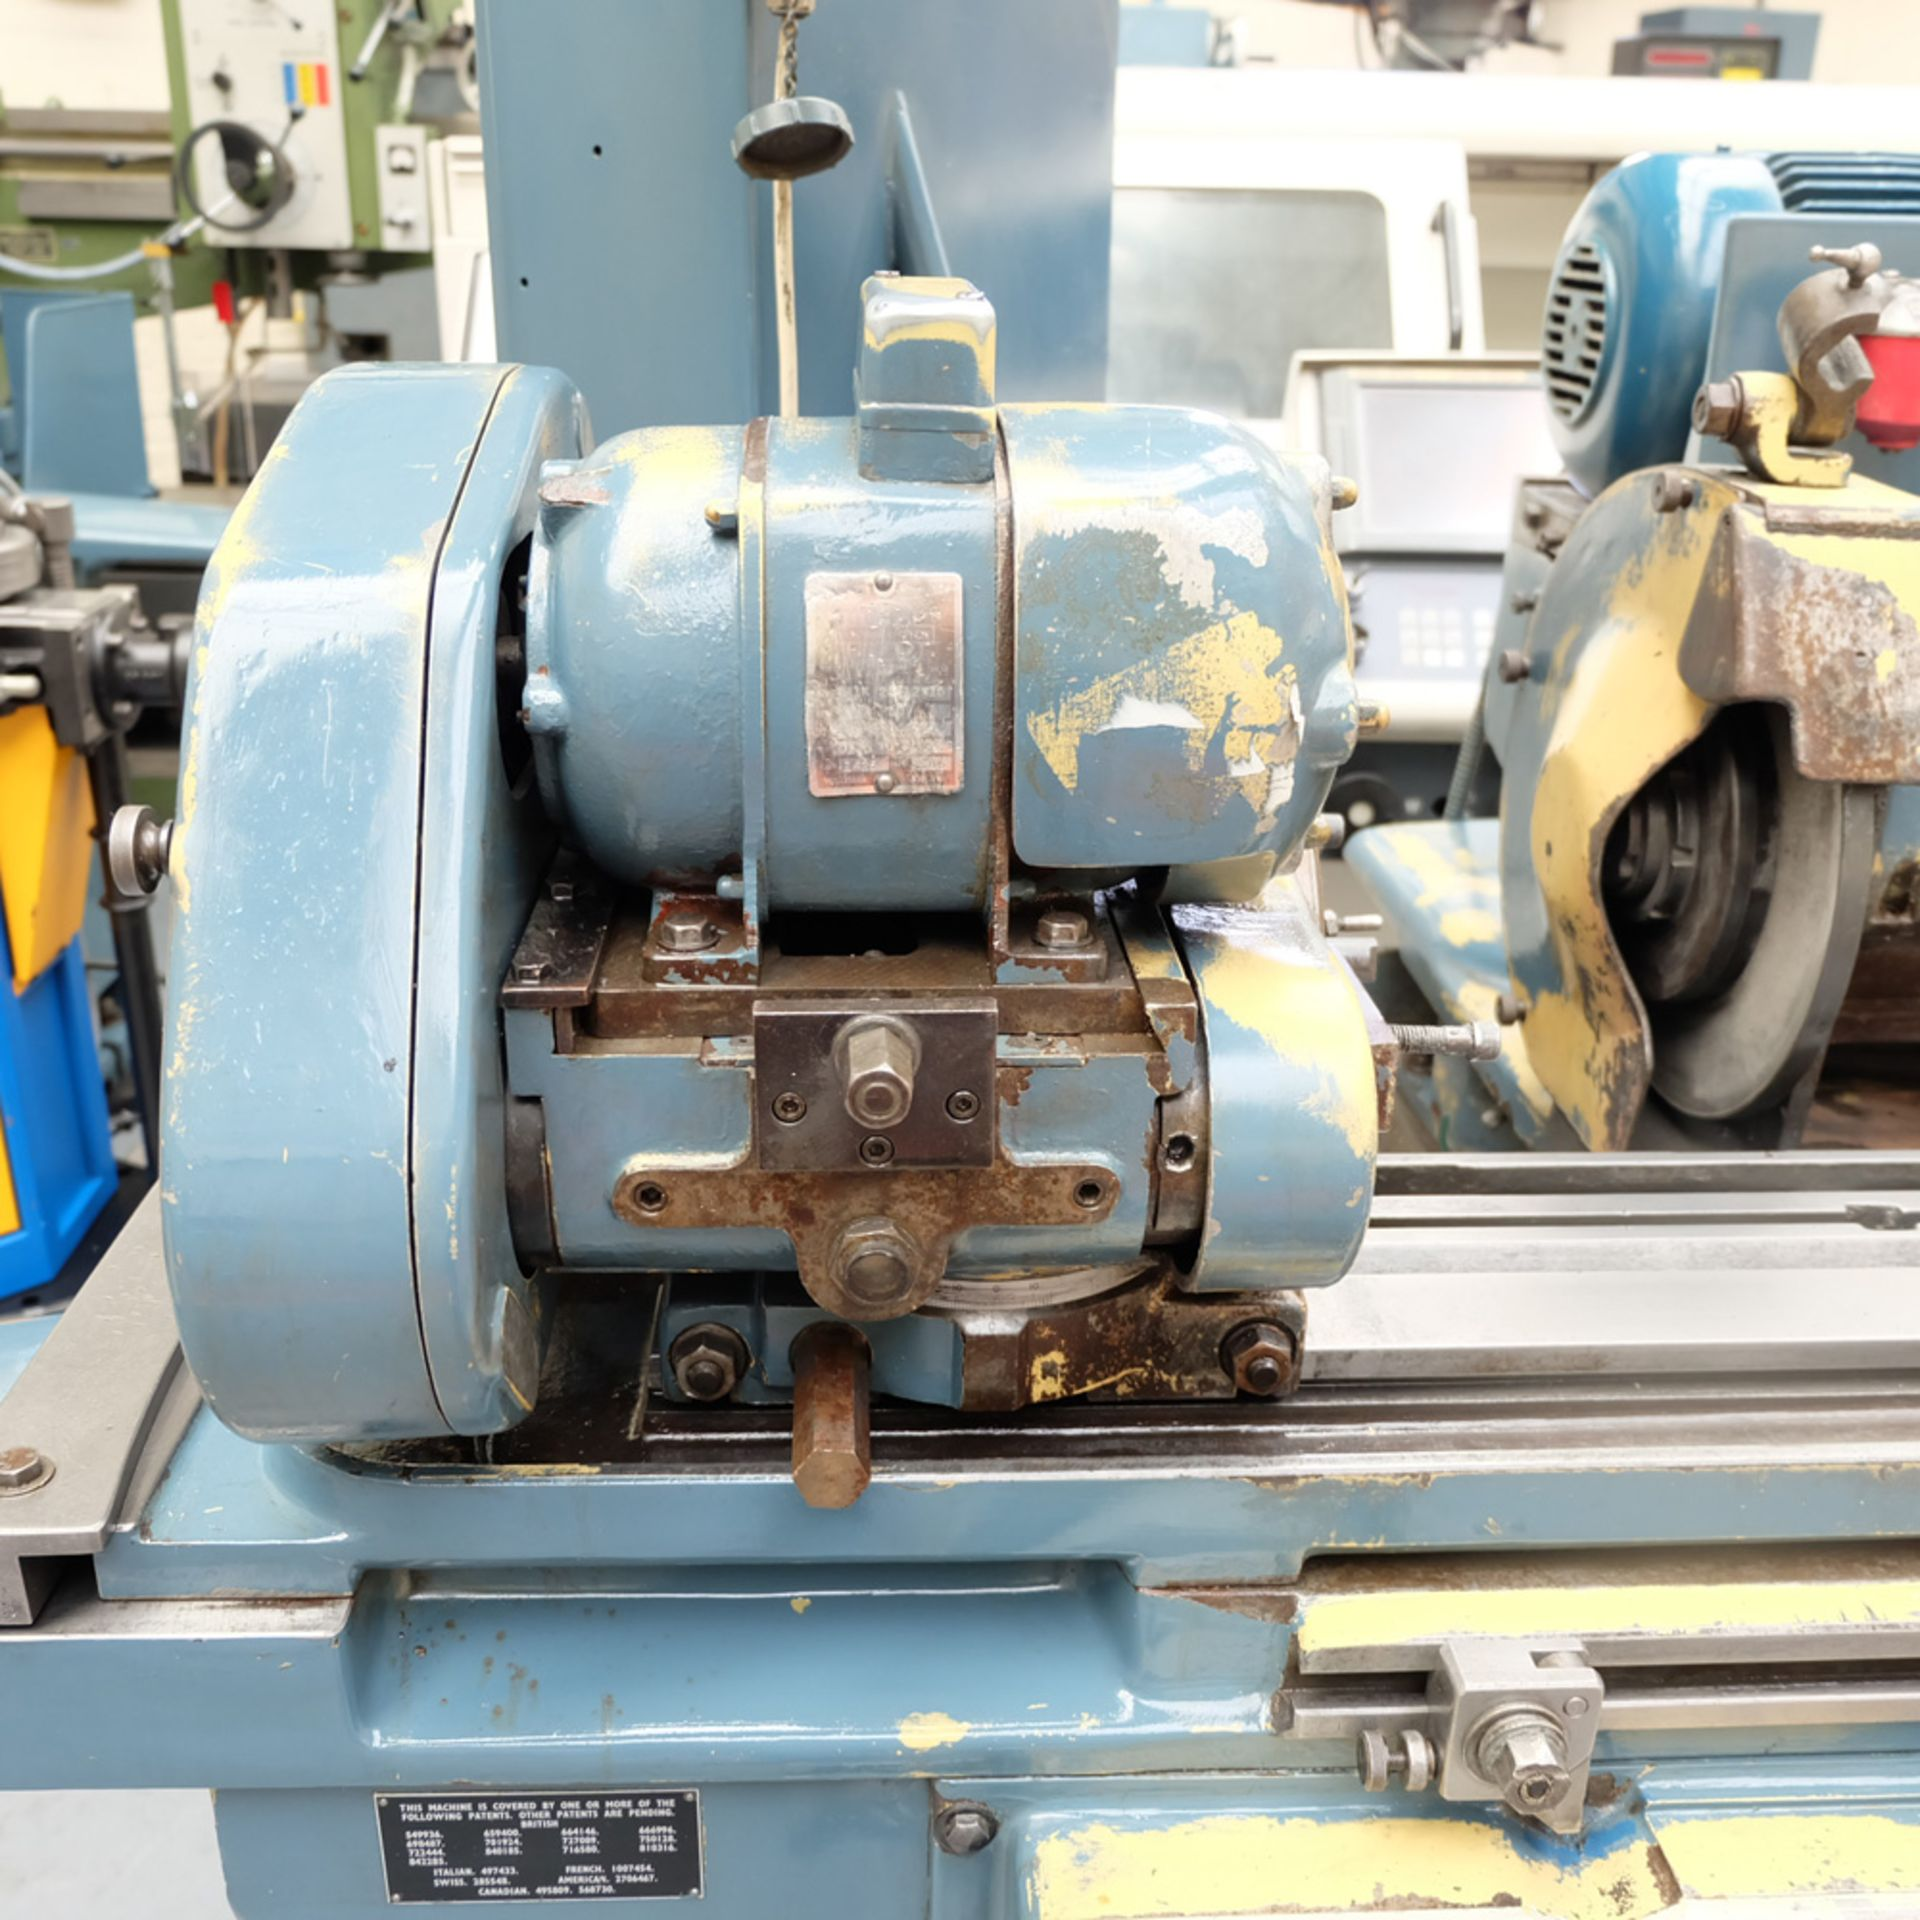 "Jones & Shipman Model 1310 EIU Universal Cylindrical Grinder. Capacity 18"" x 8"". - Image 3 of 11"